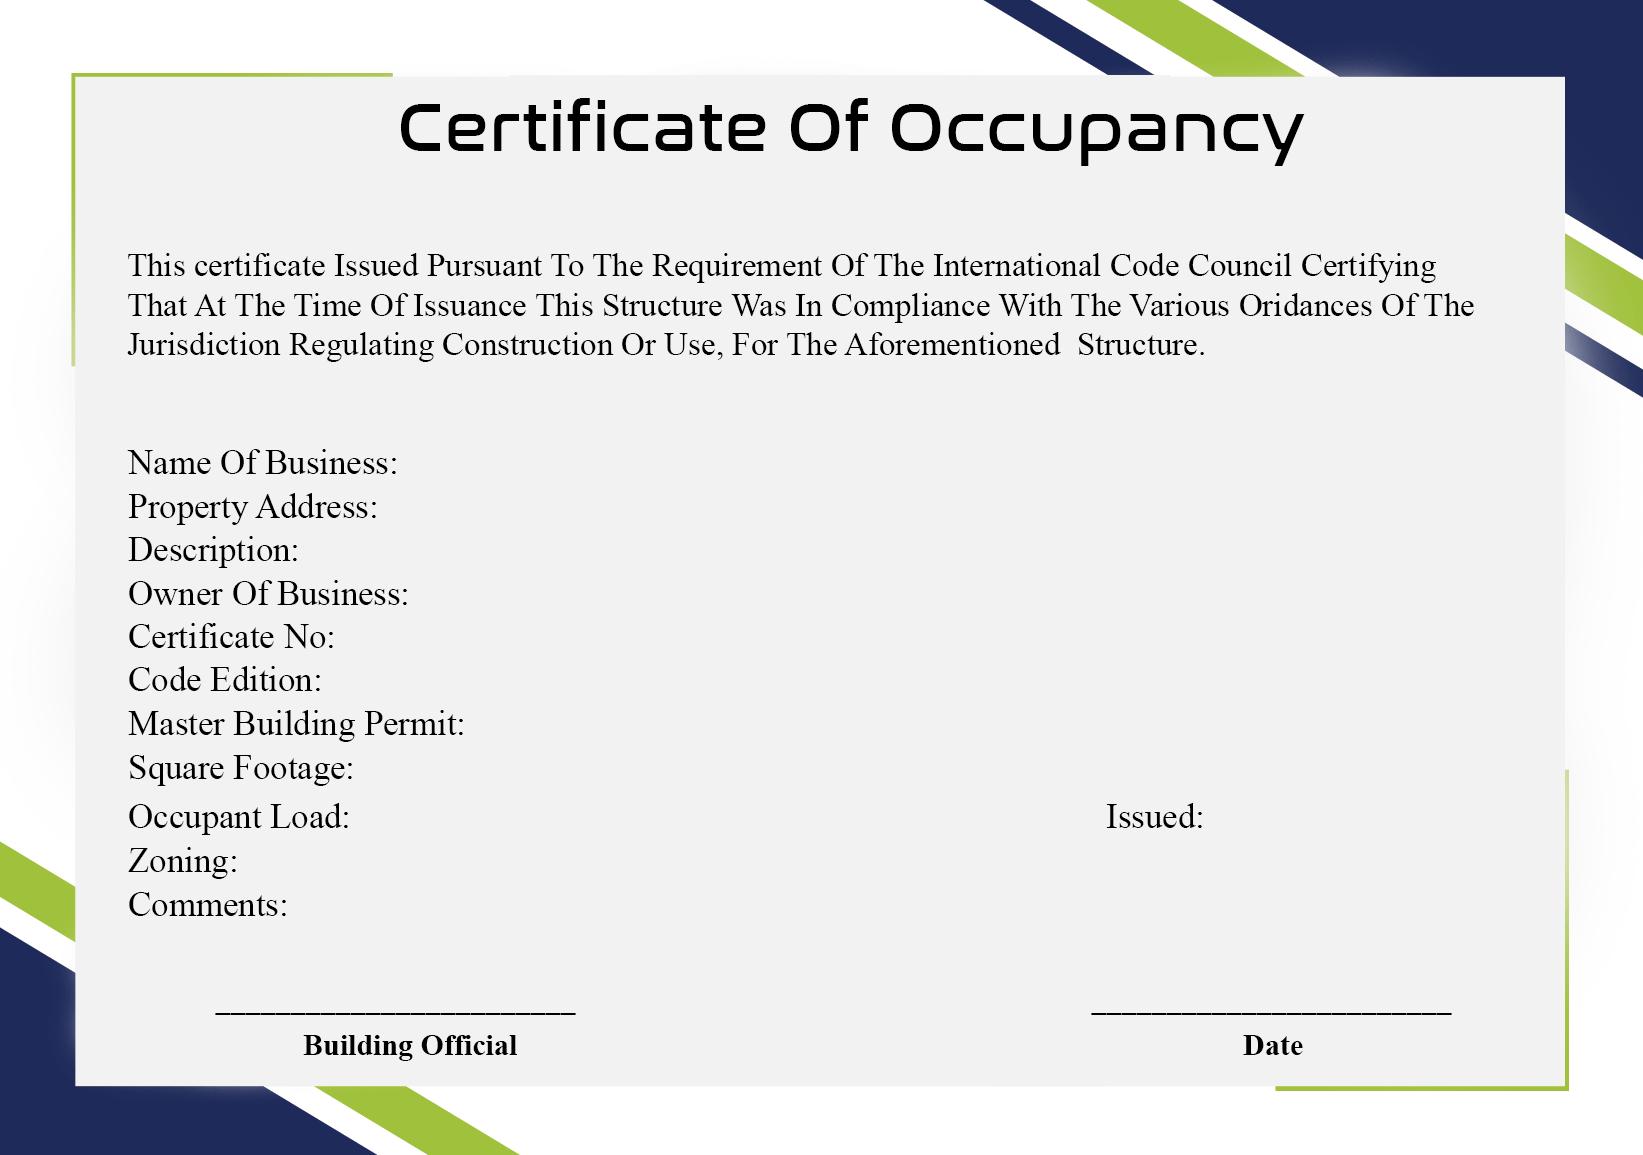 Certificate of Occupancy Sample